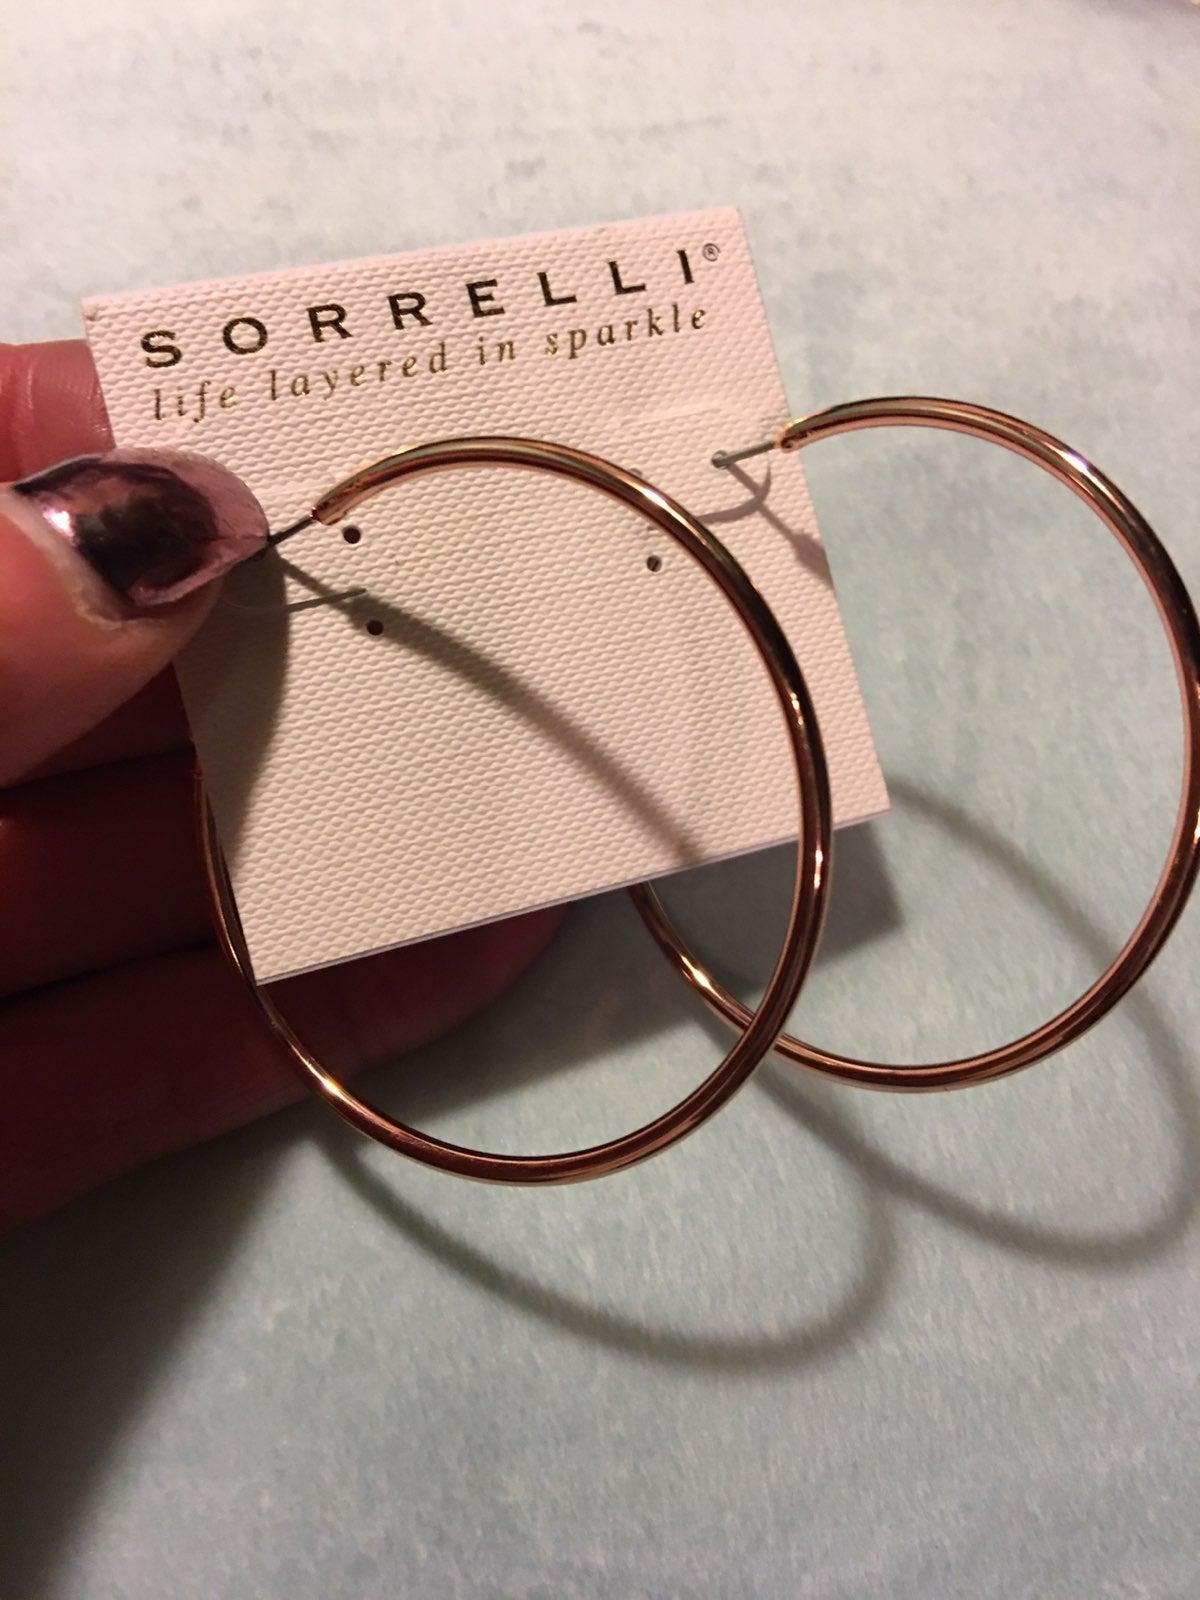 Sorrelli rose gold hoops